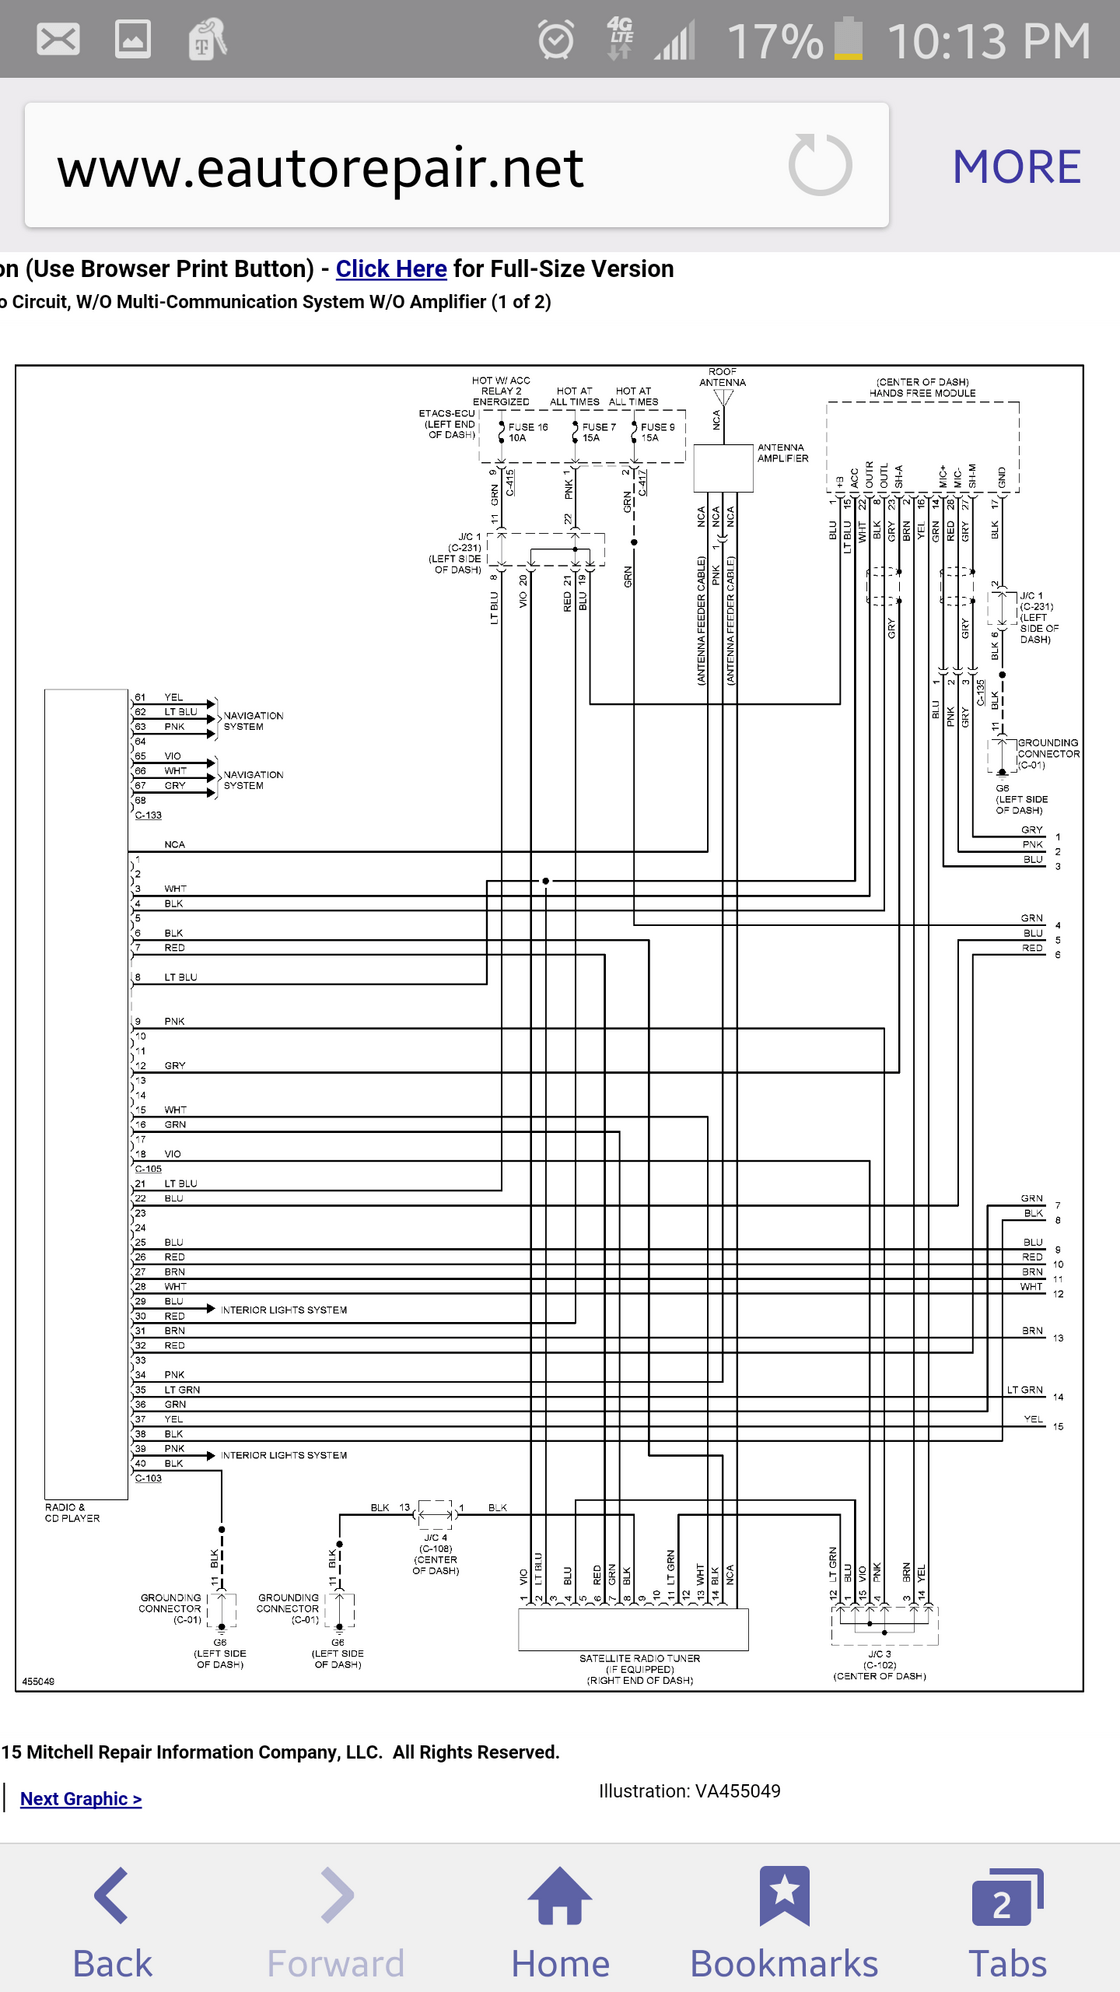 80 screenshot_2015_05_23_22_13_04_55c1943f65c7c105ae98e6703cd64127b6585656?resize\=665%2C1183\&ssl\=1 2003 mitsubishi galant es radio wiring diagram 2000 mitsubishi 2003 mitsubishi eclipse infinity sound system wiring diagram at crackthecode.co